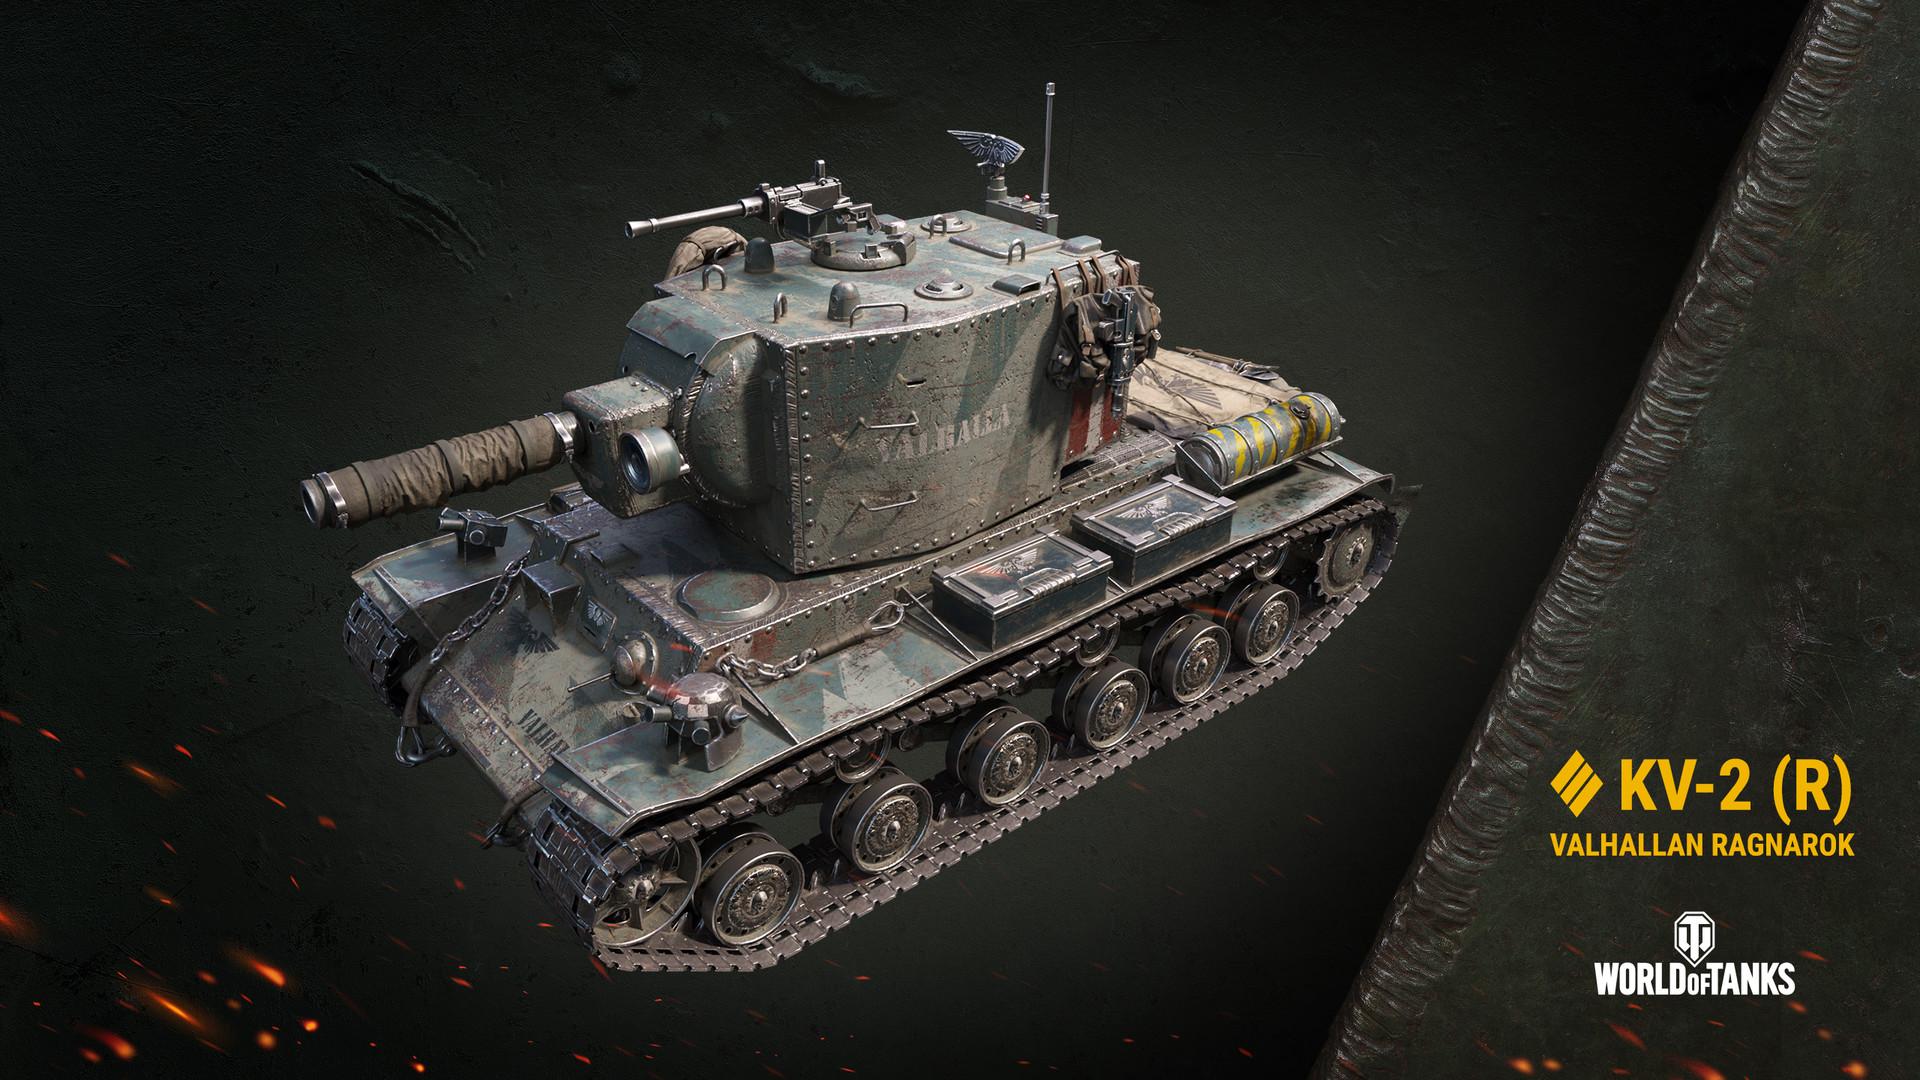 World of Tanks - Warhammer 40,000 Themed Pack Fiyat Karşılaştırma